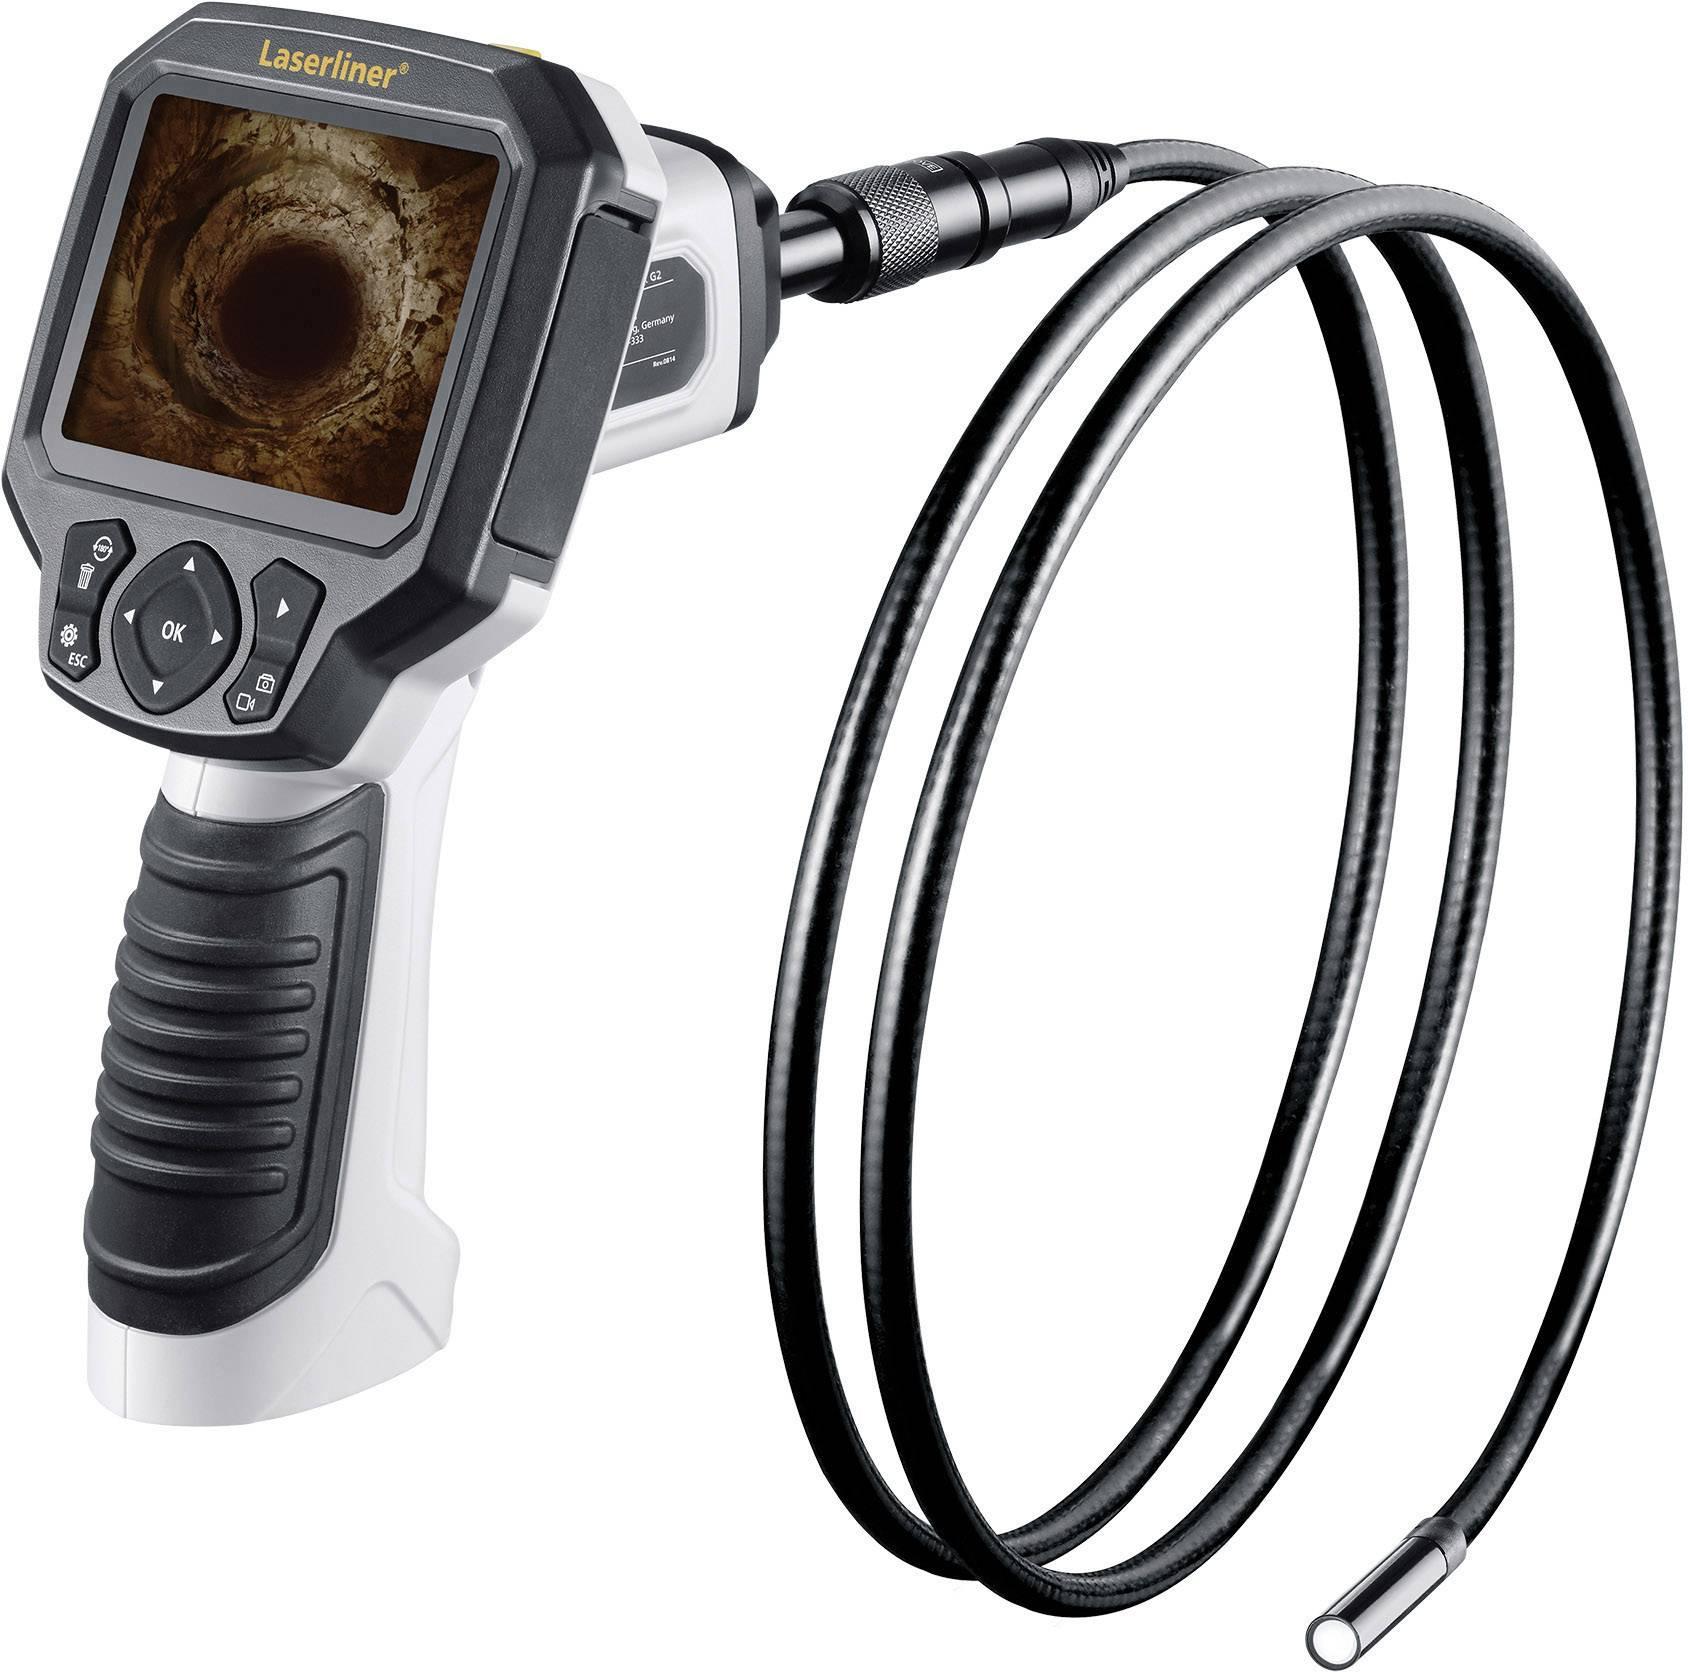 Inspekčná kamera endoskopu Laserliner VideoFlex G3, Ø sondy 9 mm, dĺžka sondy 1.5 m